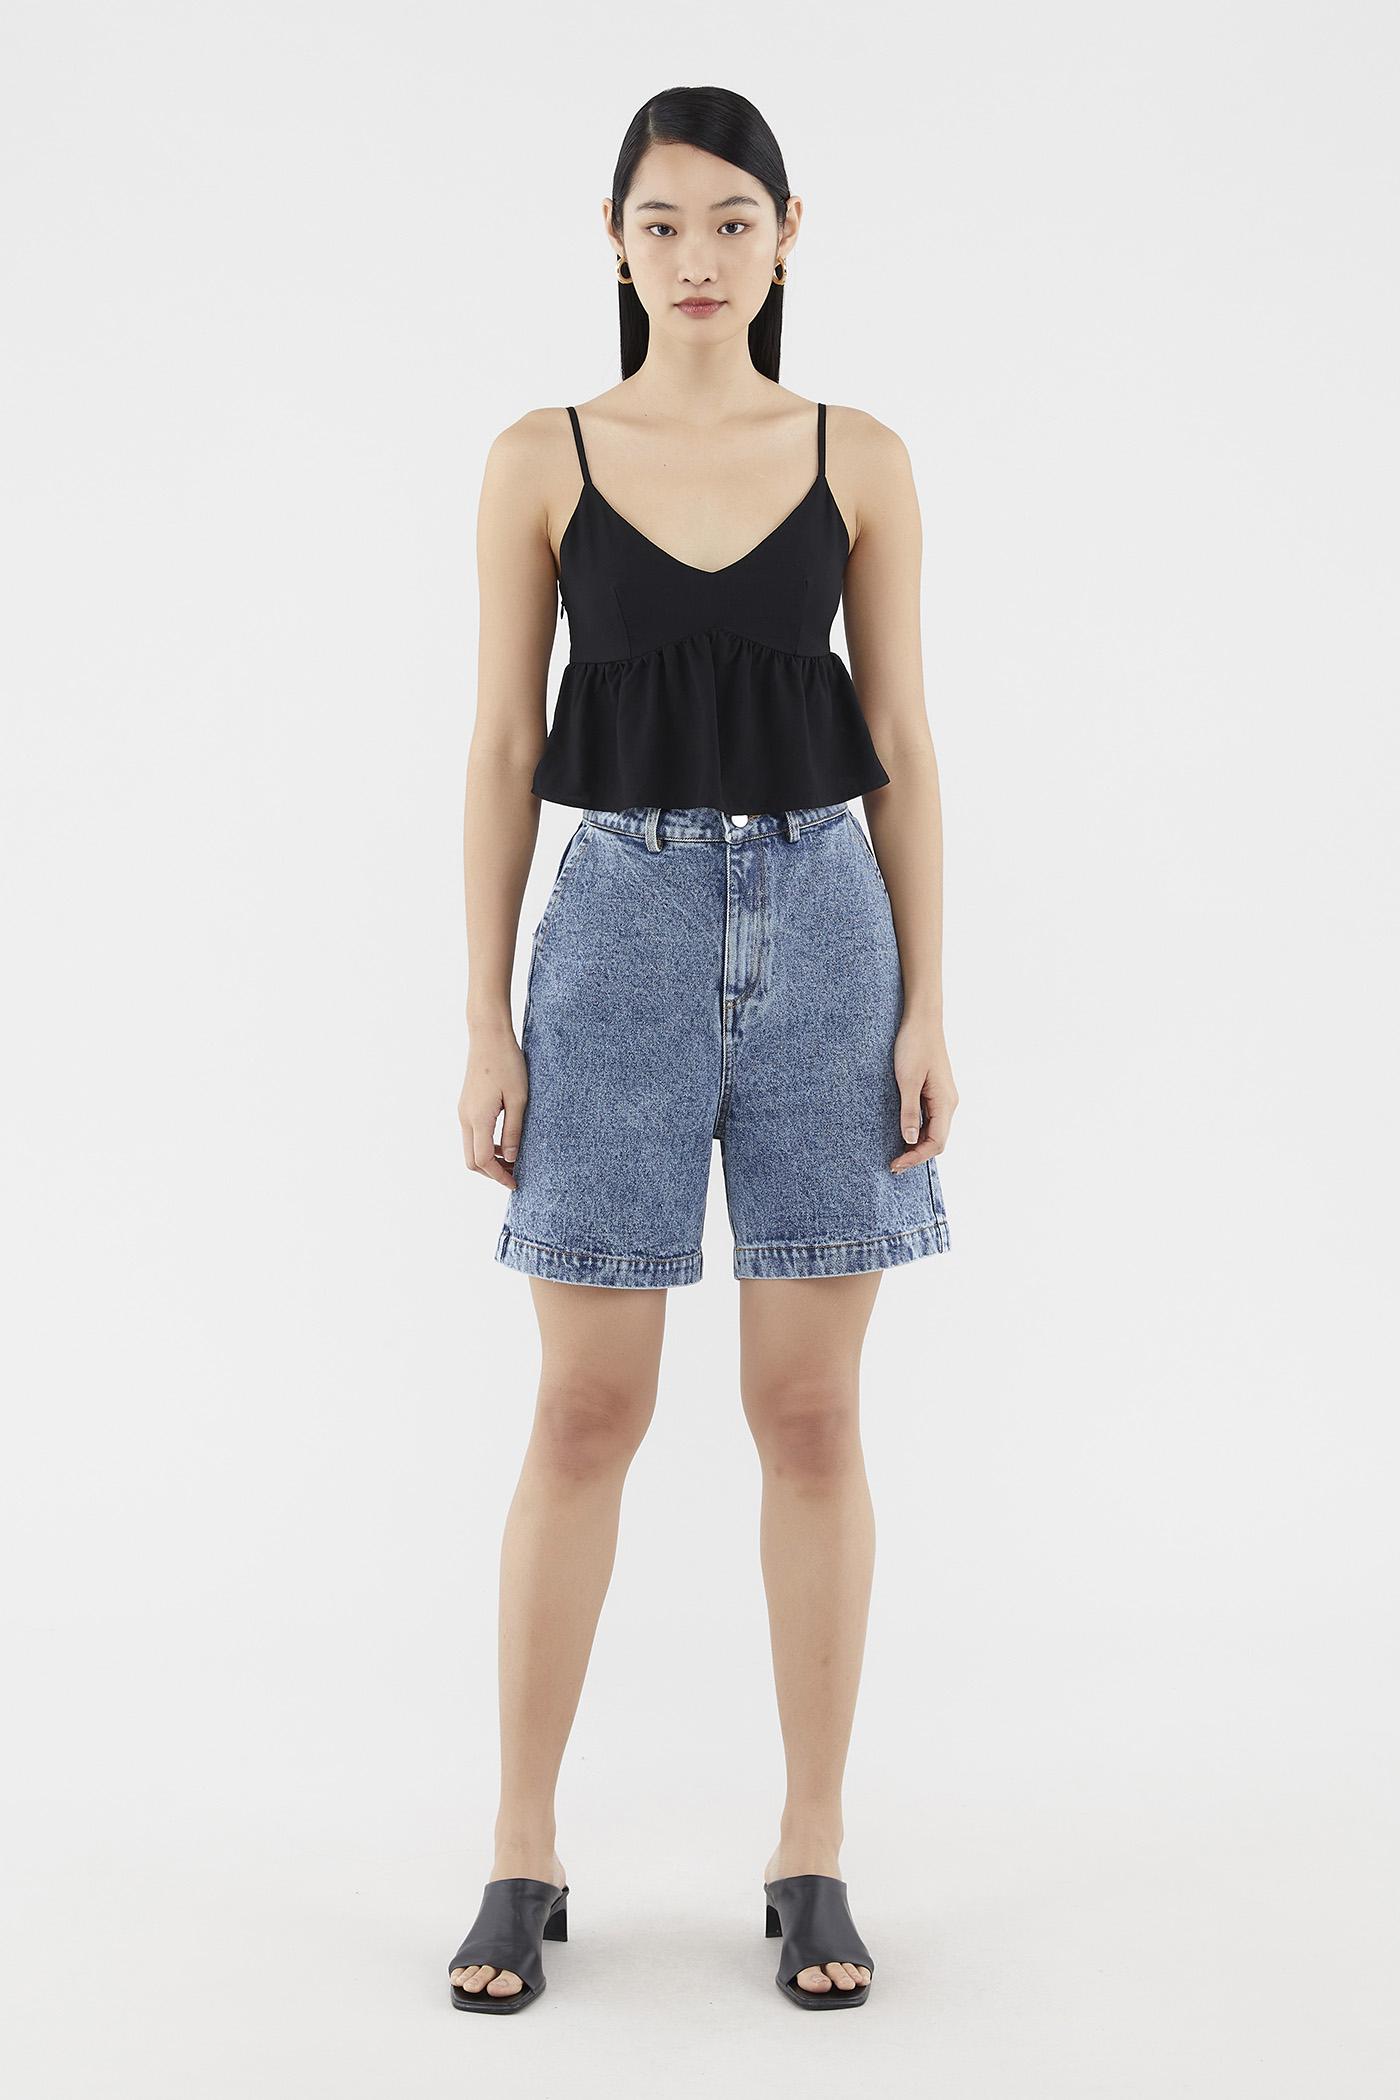 Freada Bermuda Shorts